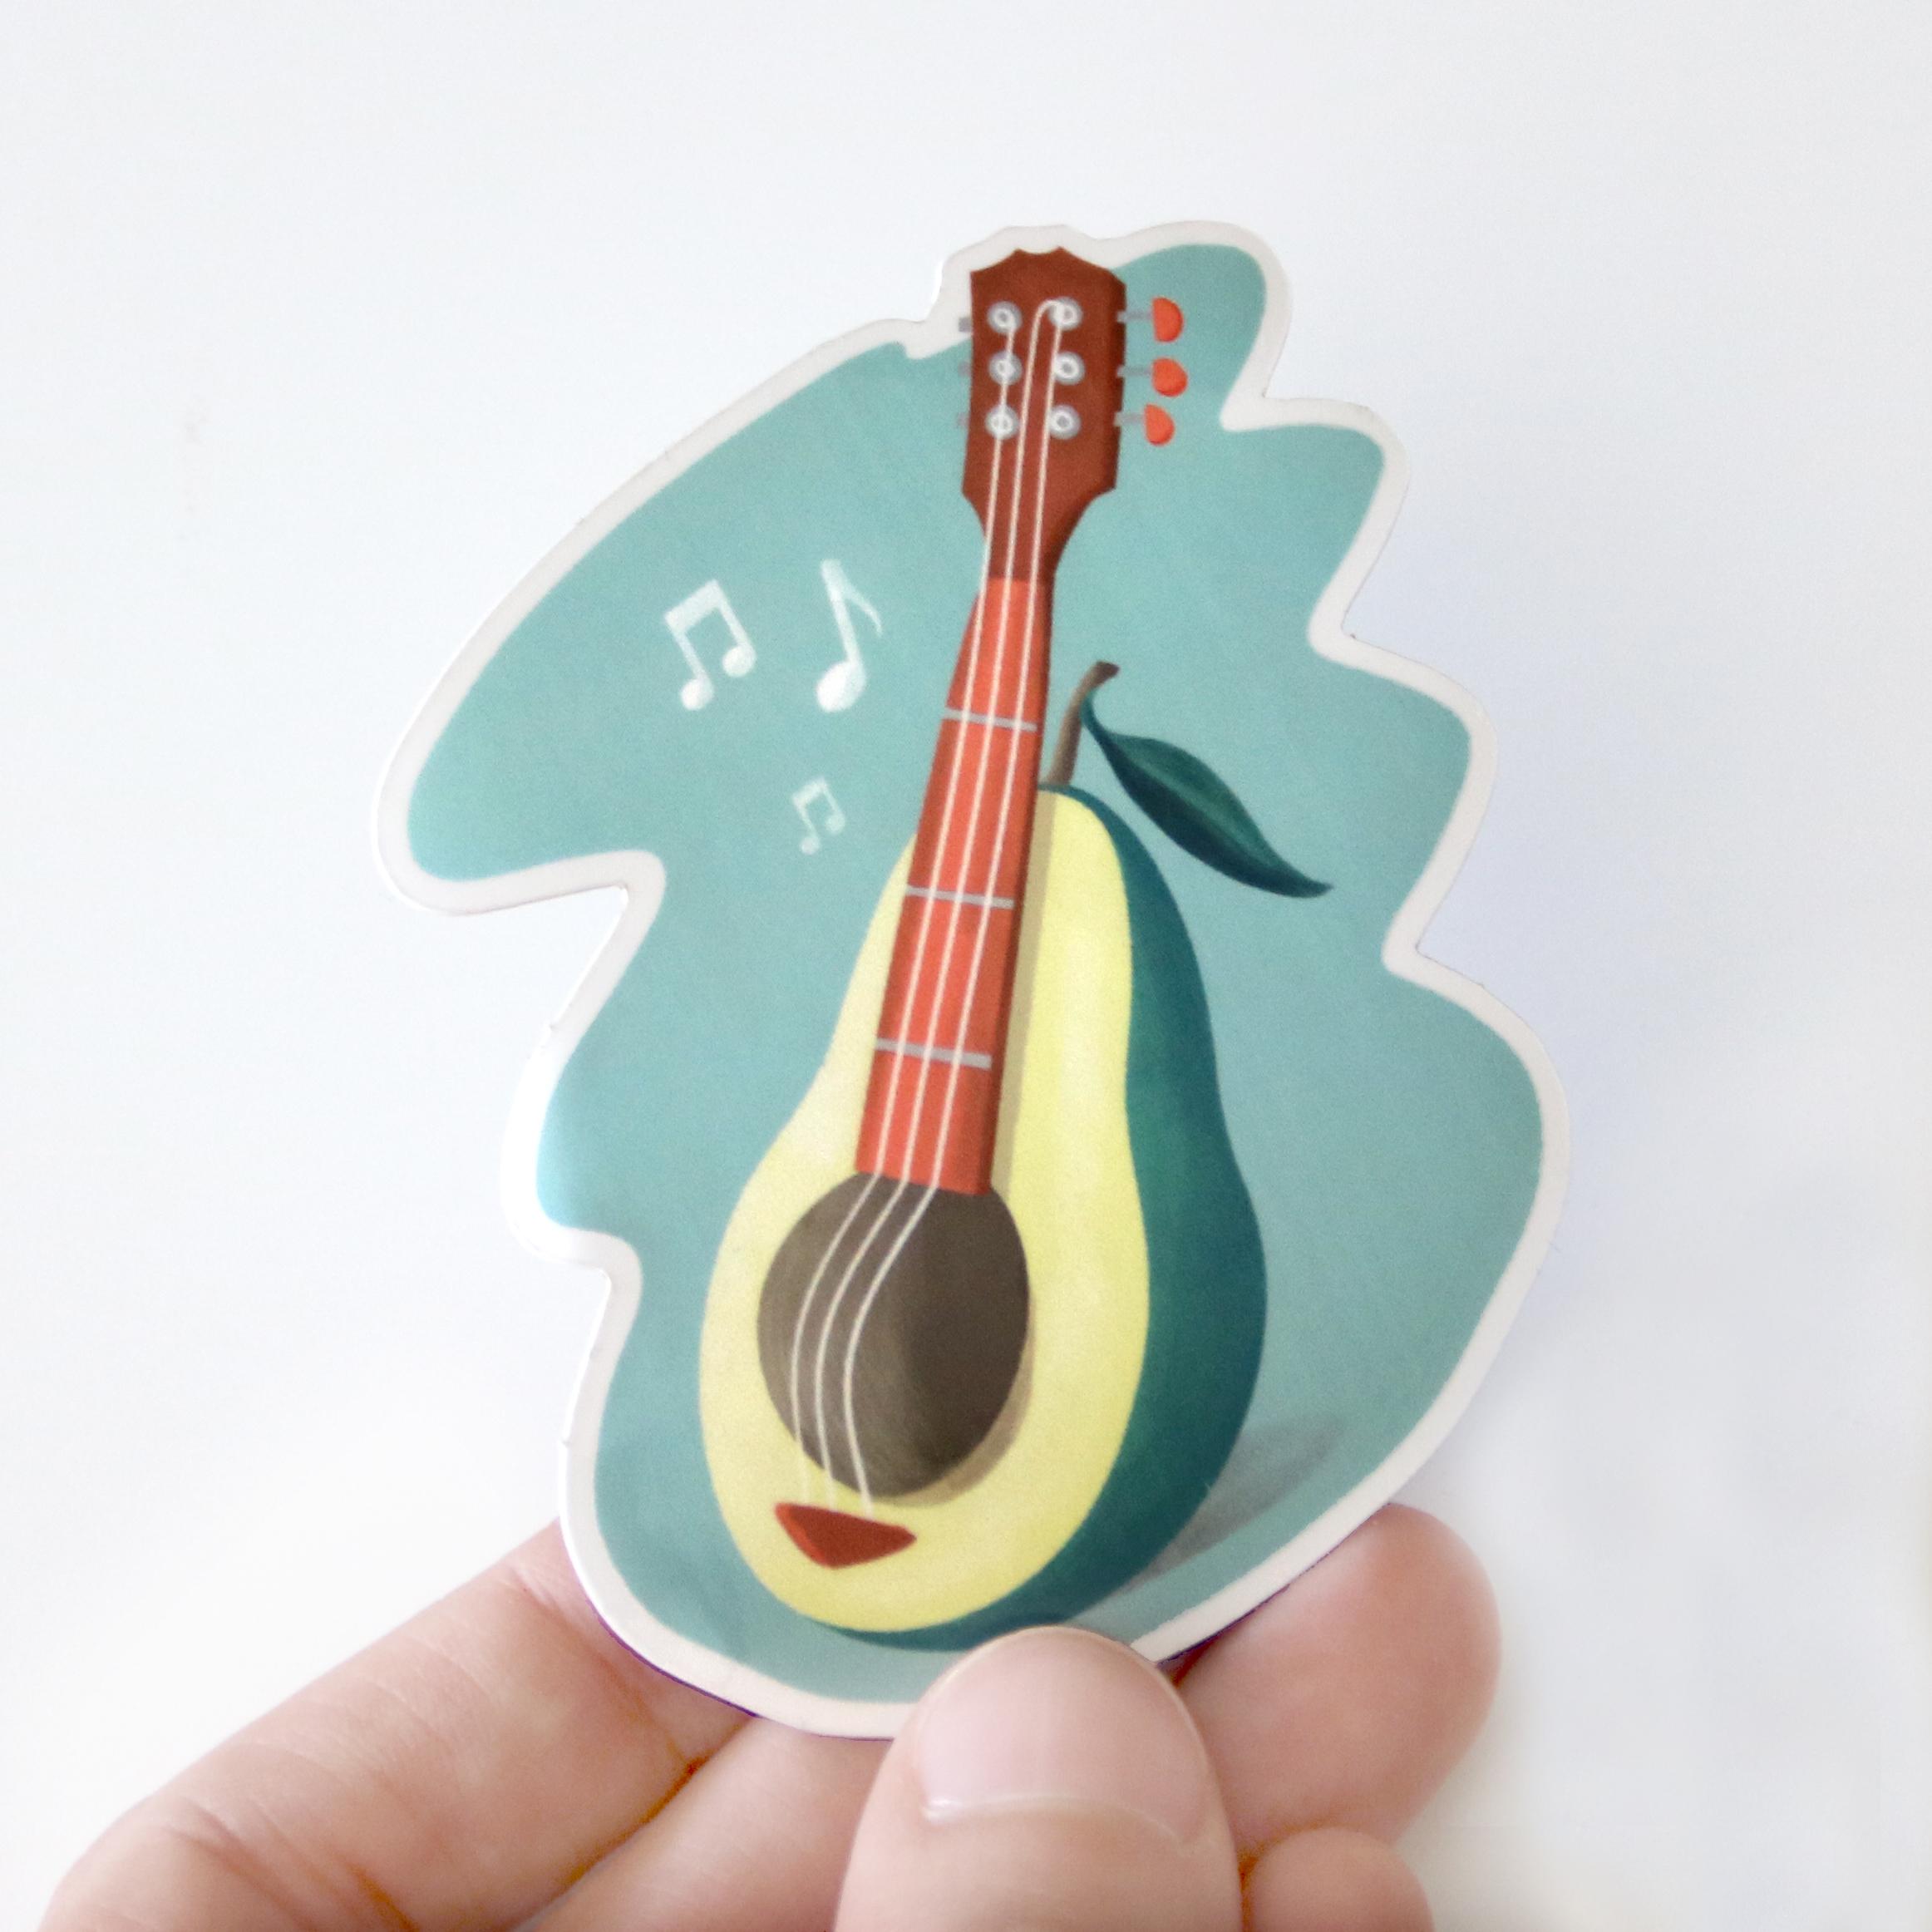 stickerapp-sweetcandyroll-Avocado-sound